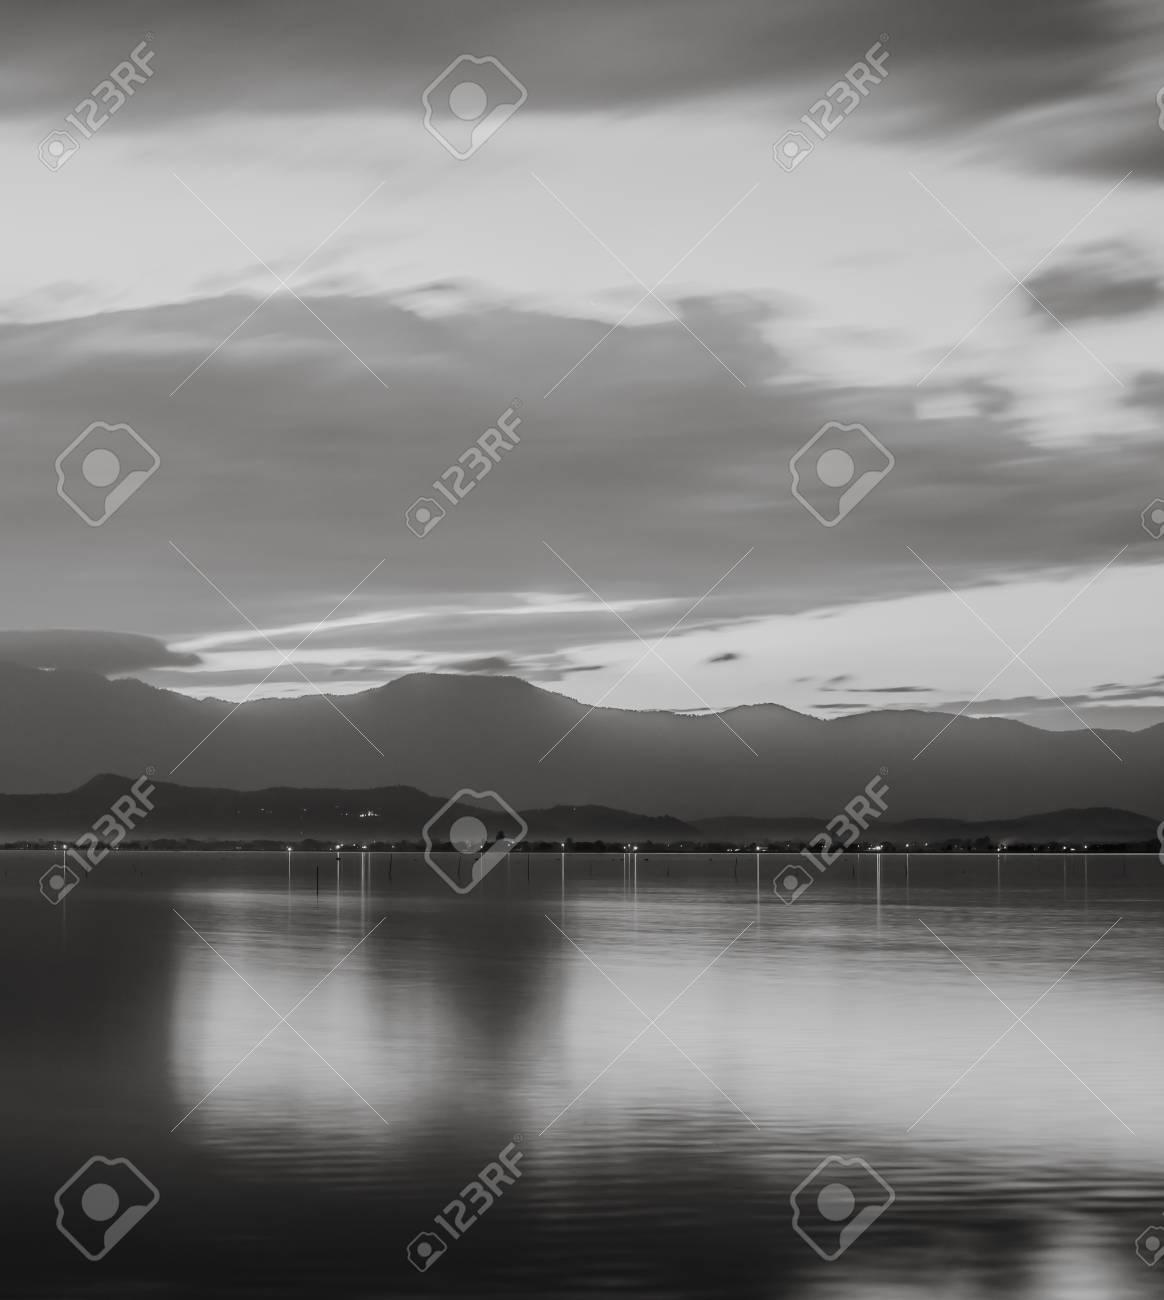 Beautiful long exposure black and white minimalist scene